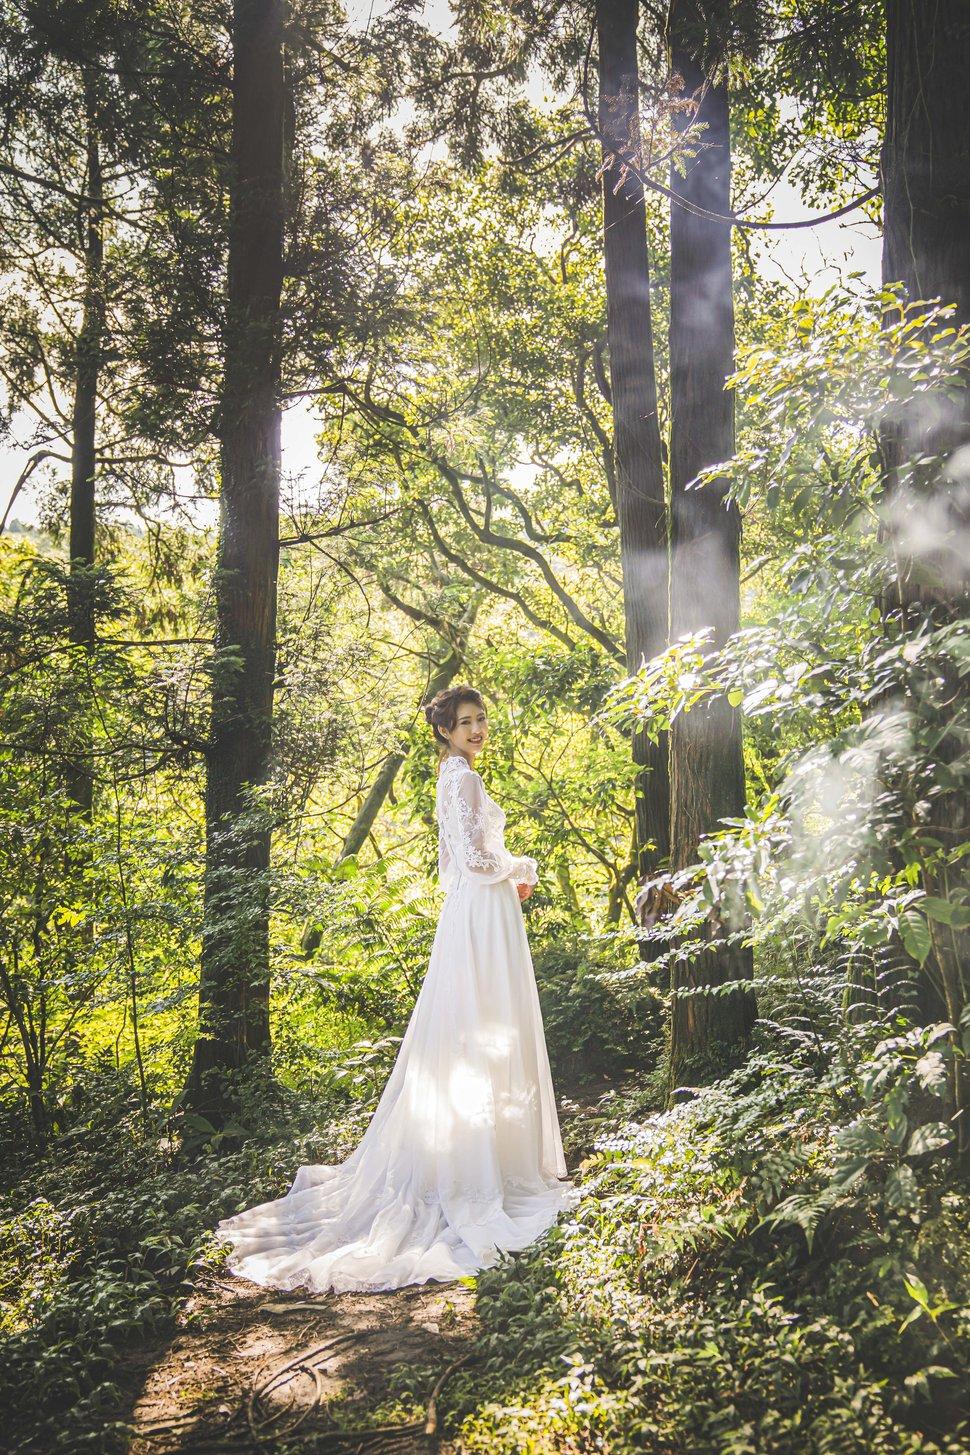 GM_06714 - GM俊彥 uxrw art studio - 結婚吧